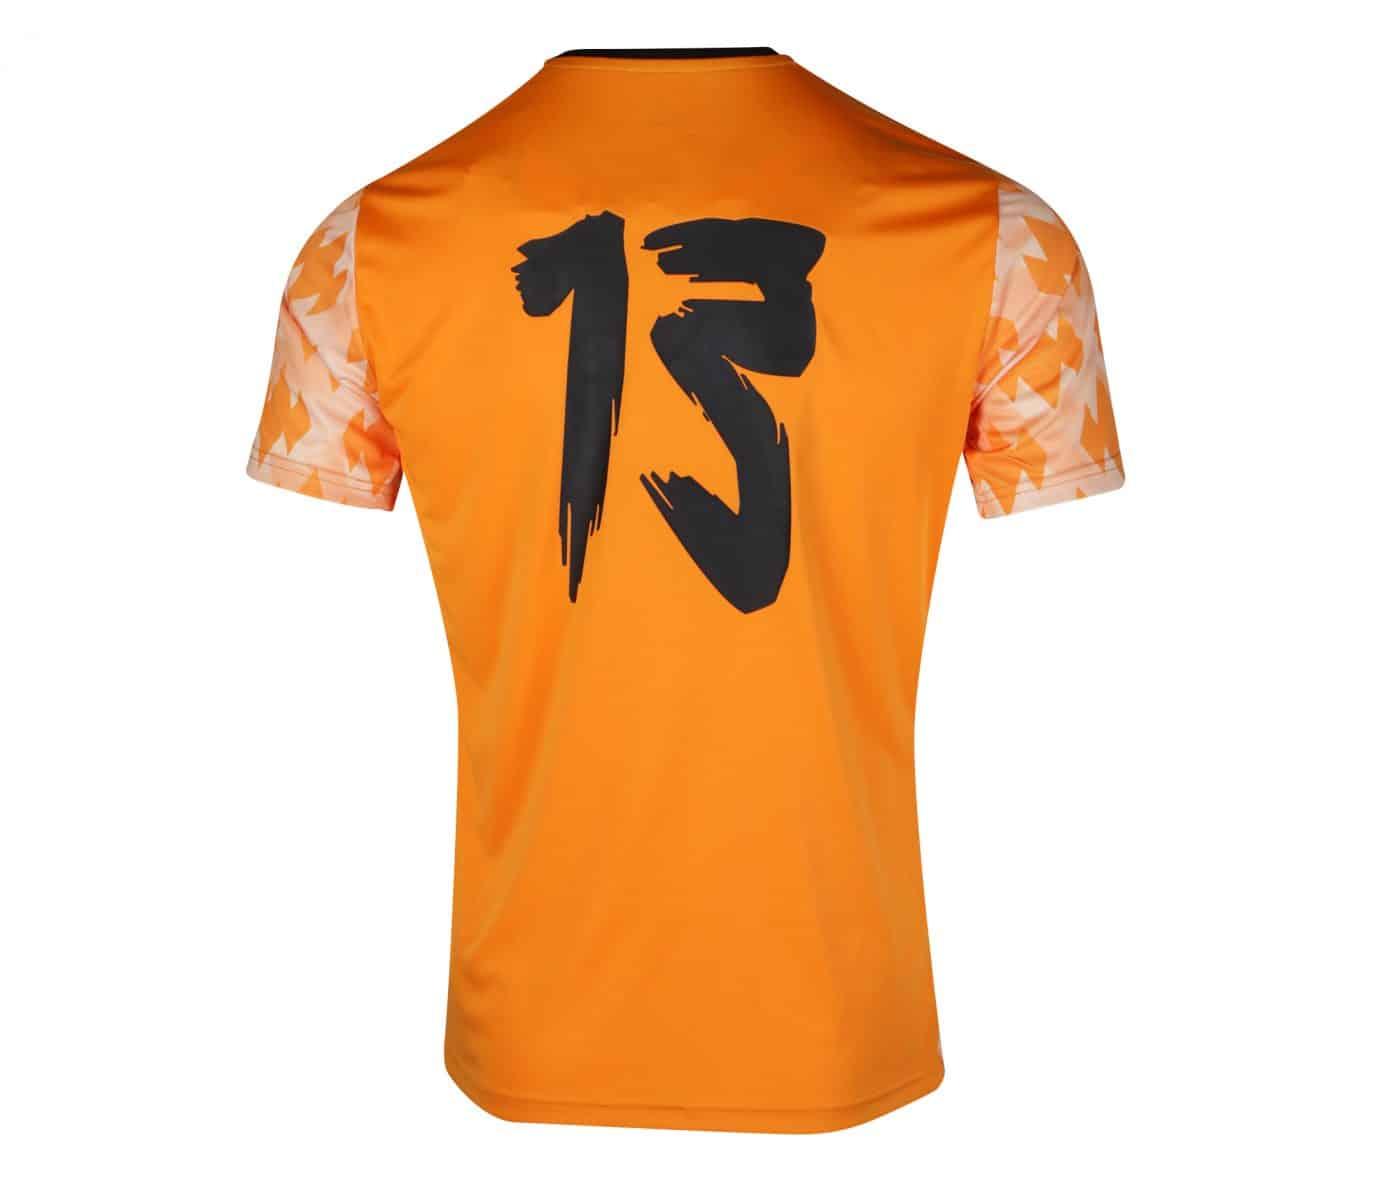 puma-influence-jersey-olympique-de-marseille-23